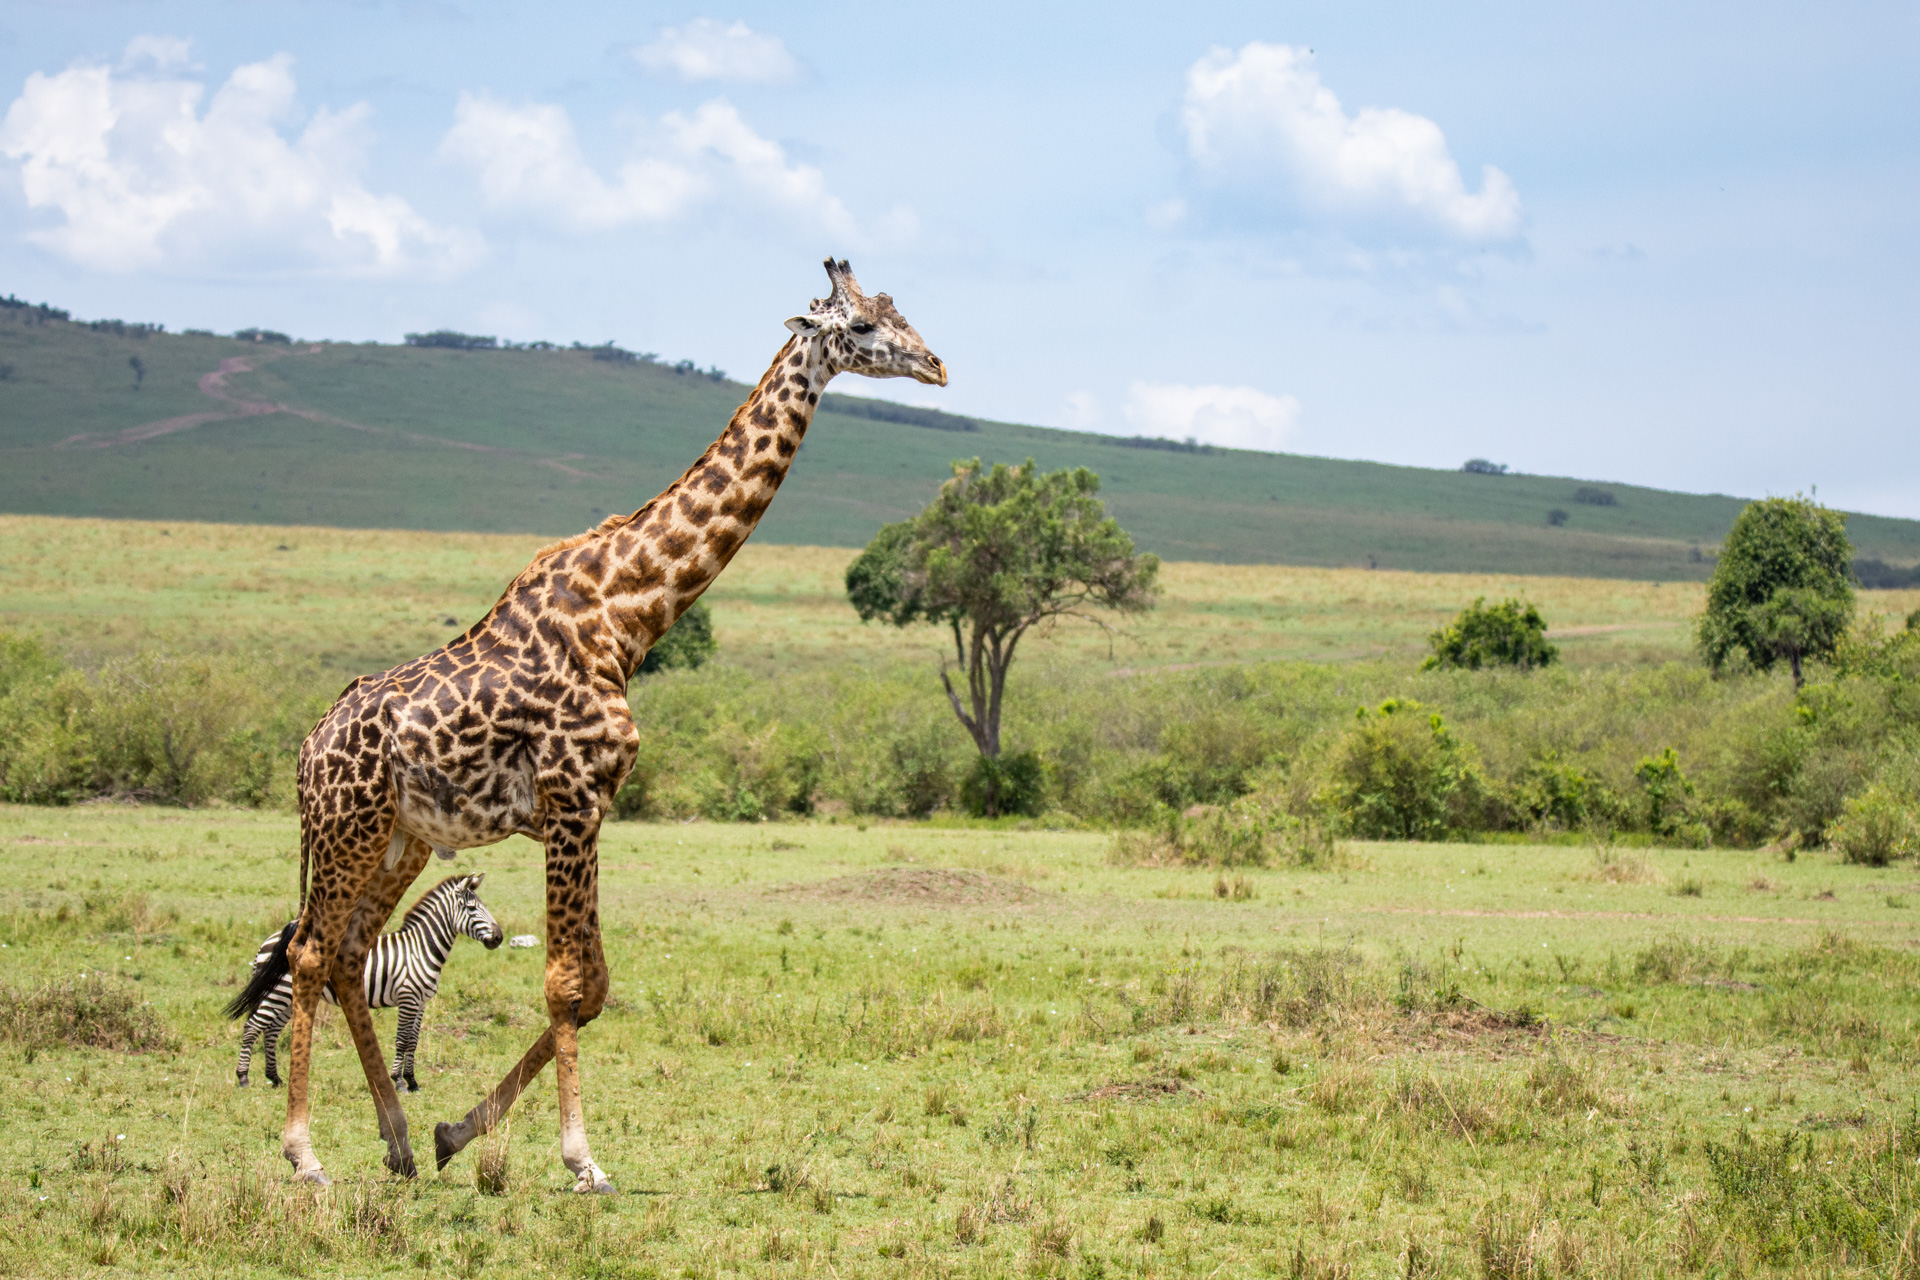 Giraffe running and zebra between it's legs